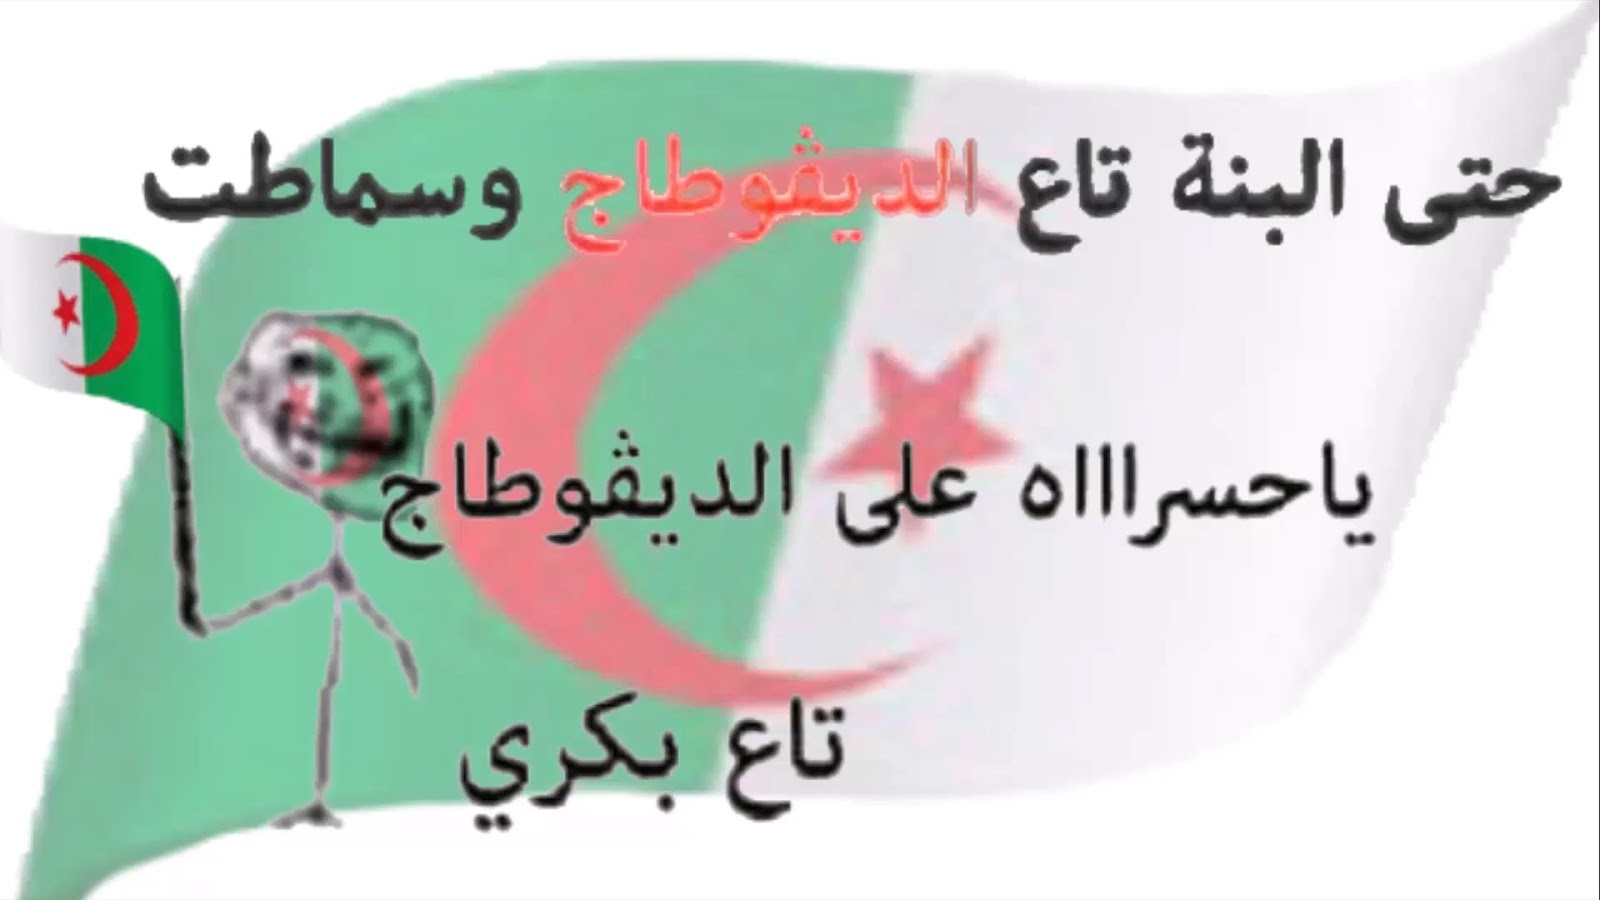 الجزائر نكت جزائرية مضحكة جدا نكت جديدة 2019